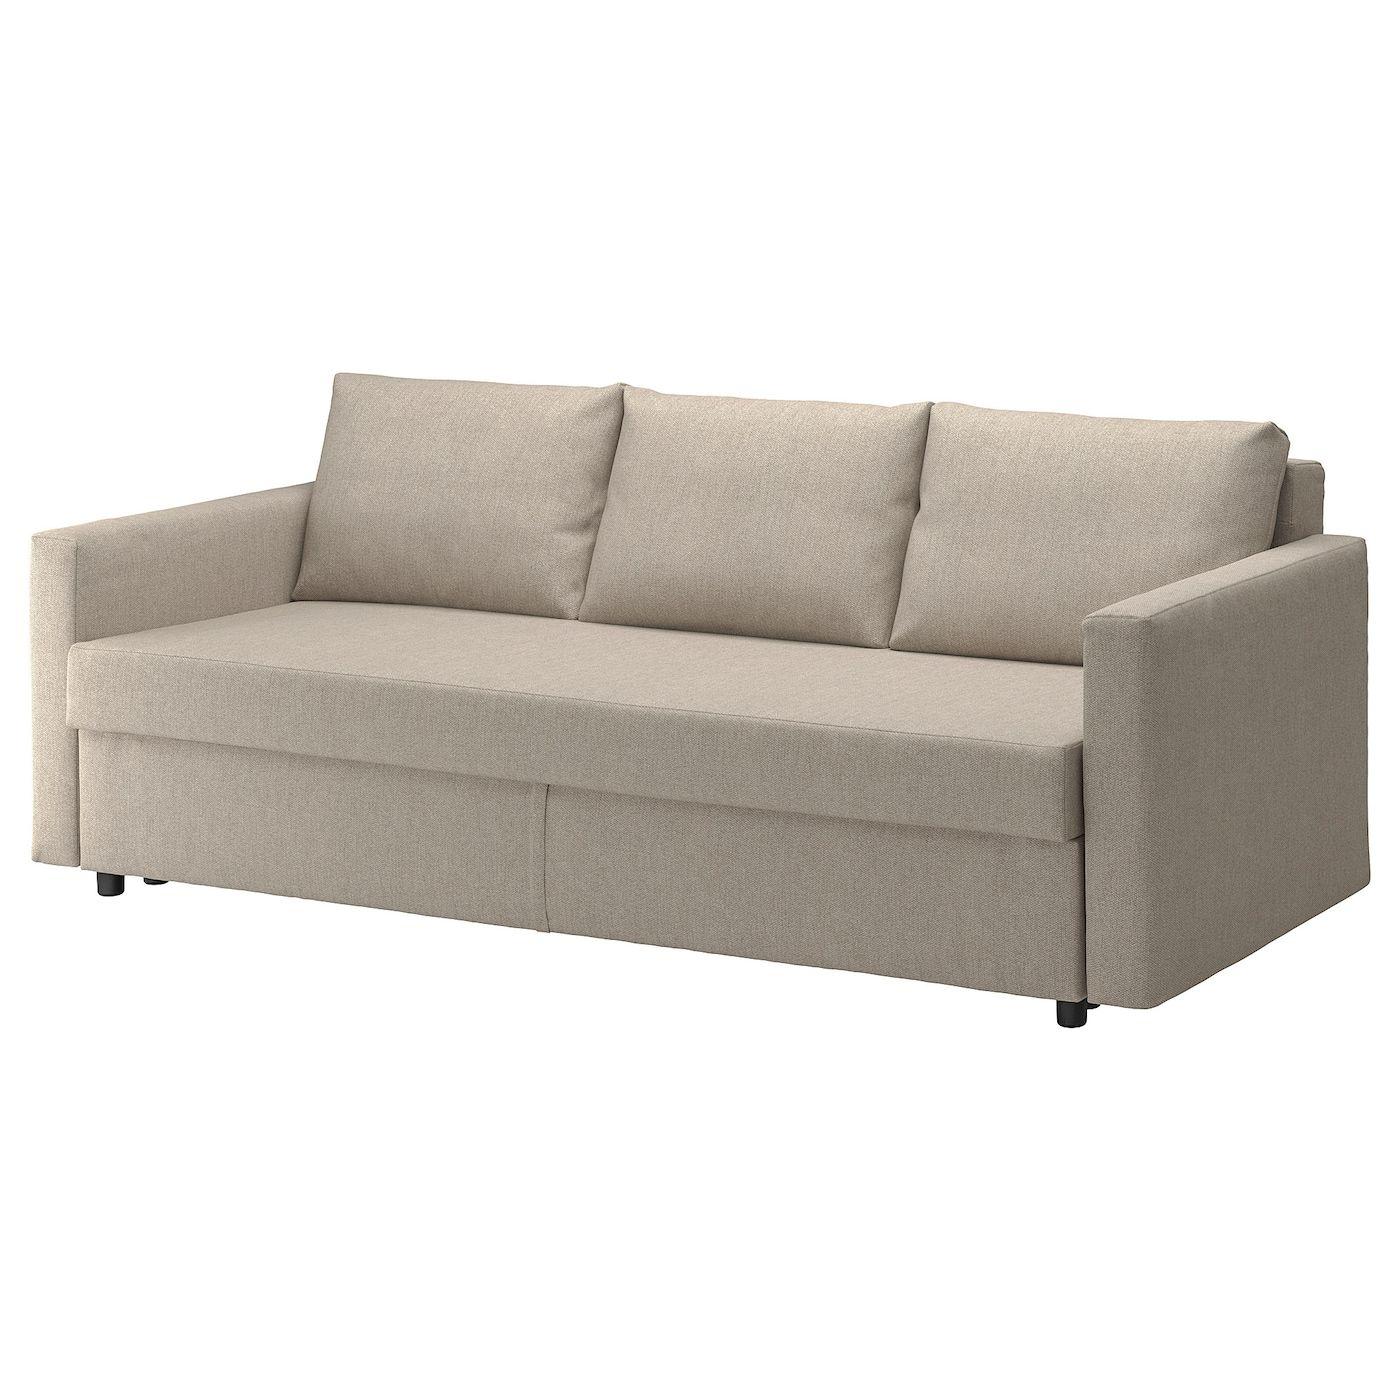 Friheten Sleeper Sofa Hyllie Beige Sofa Bed With Storage Sofa